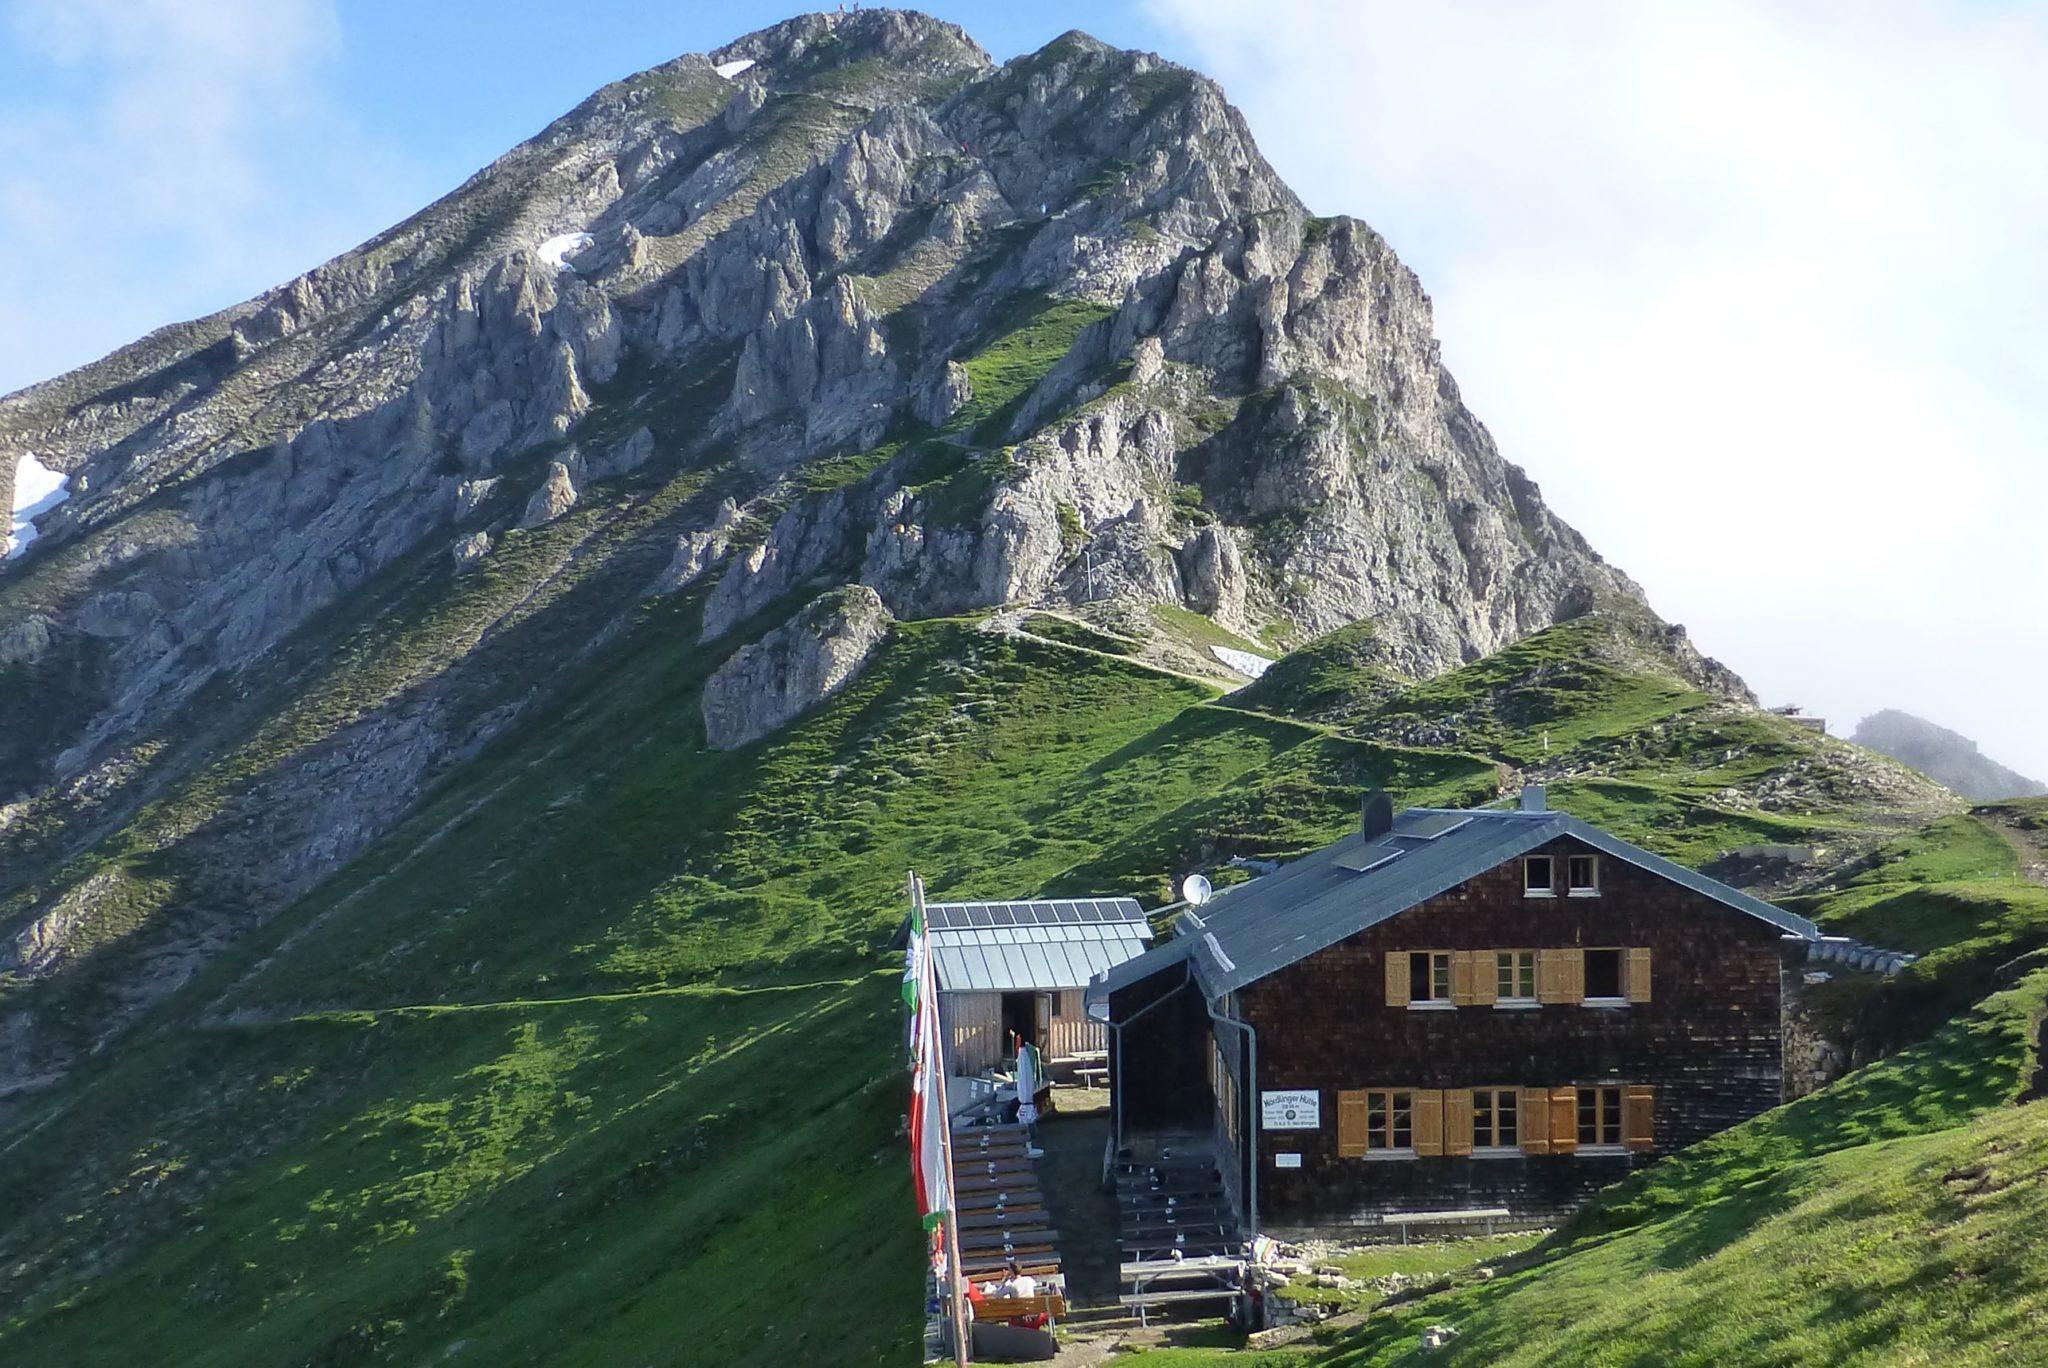 Nördlingerhütte